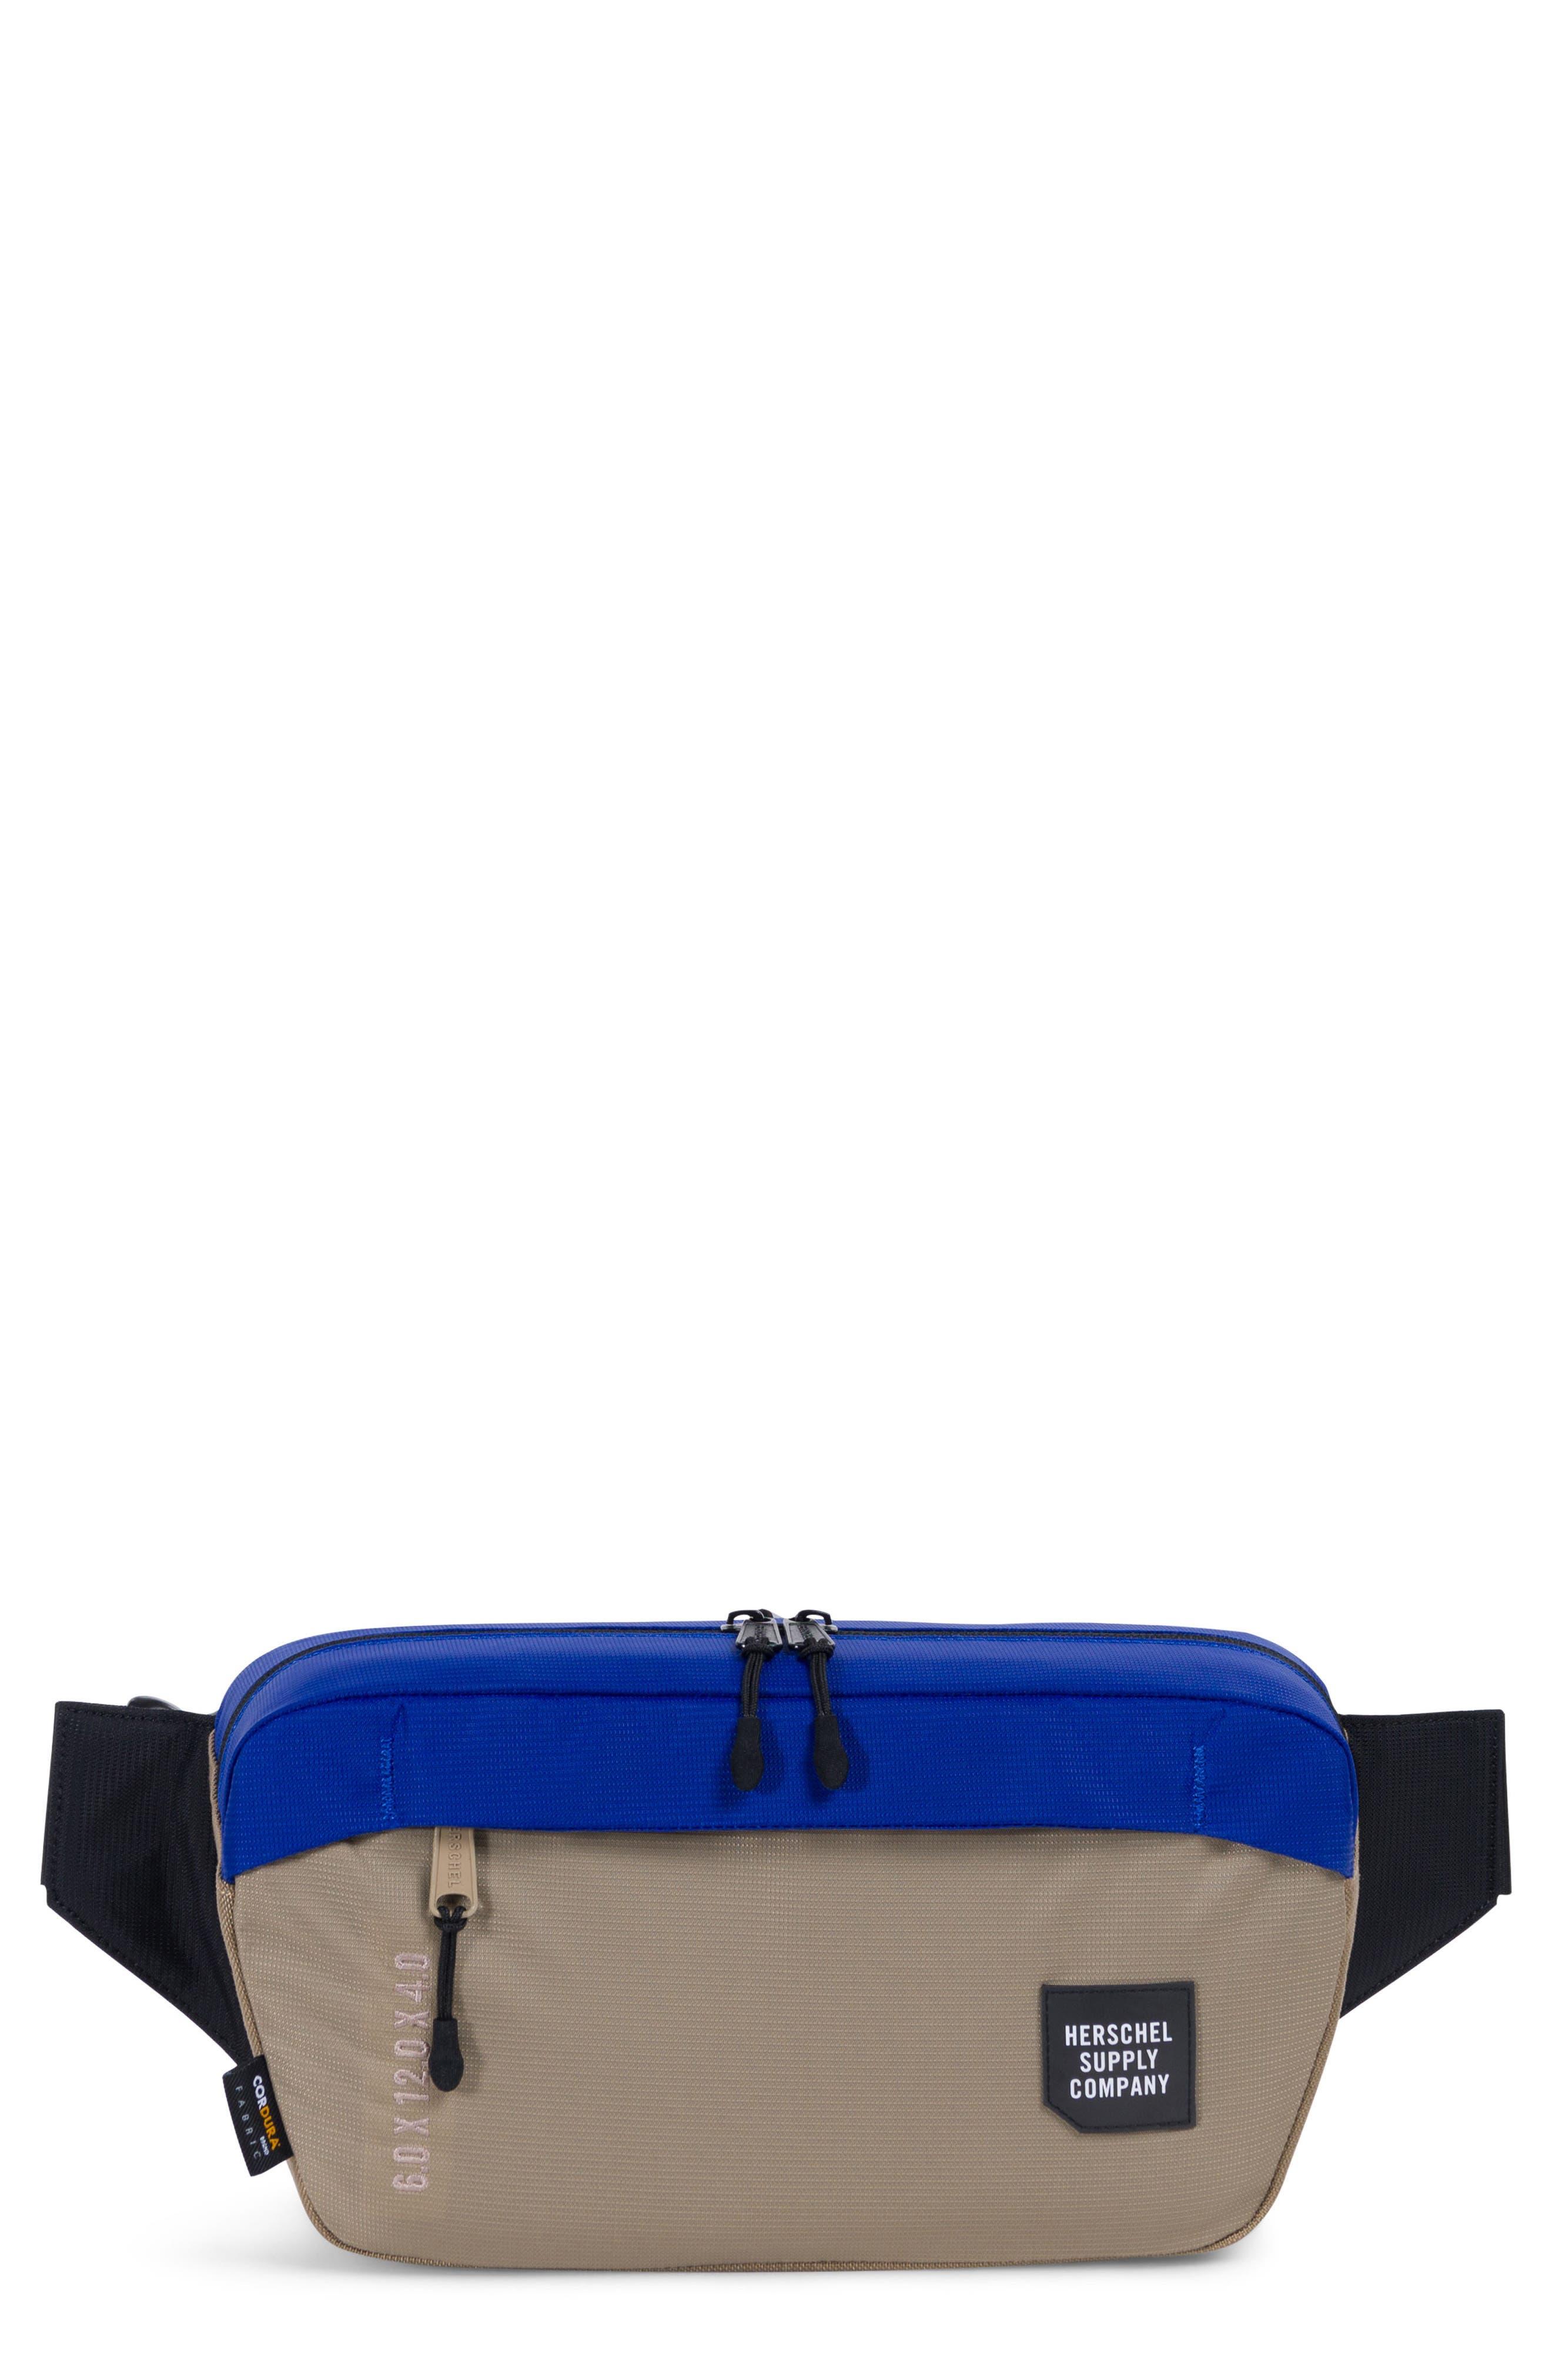 Herschel Supply Co. Tour Trail Belt Bag